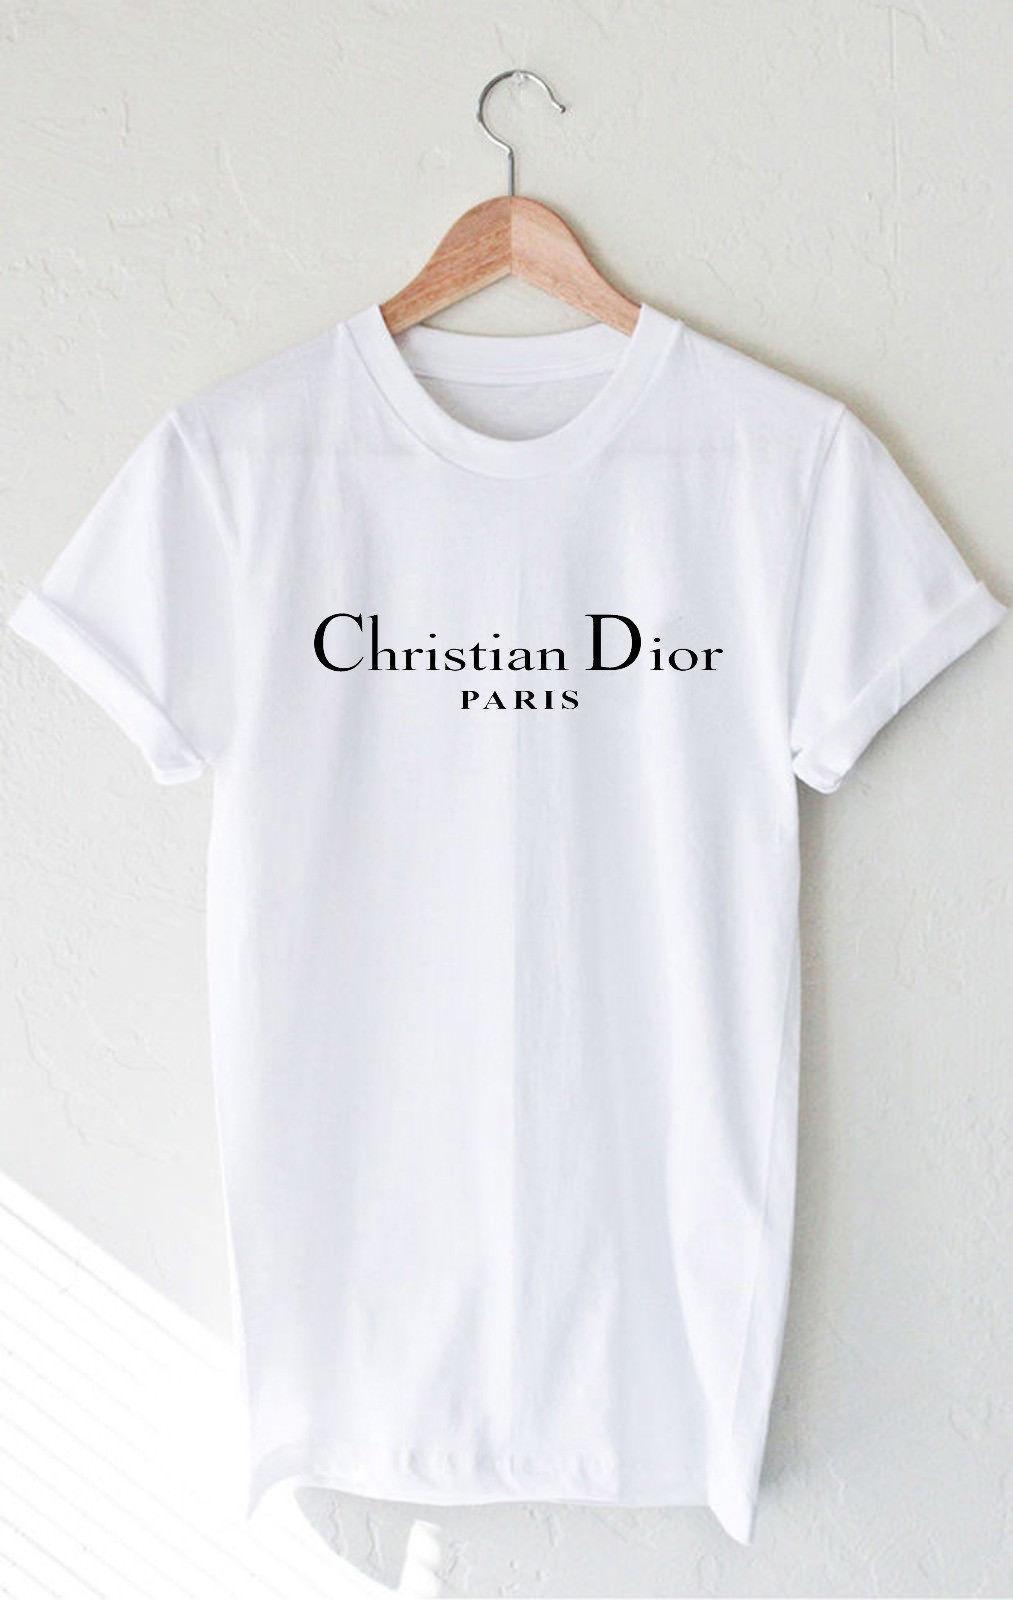 c78d4b026 Cheap T Shirt Famous Brand Luxury Logo Men Women S M L XL 2XL 3XL Mens T- Shirt Summer O Neck Cotton Summer Short Sleeves T-Shirt Fashion